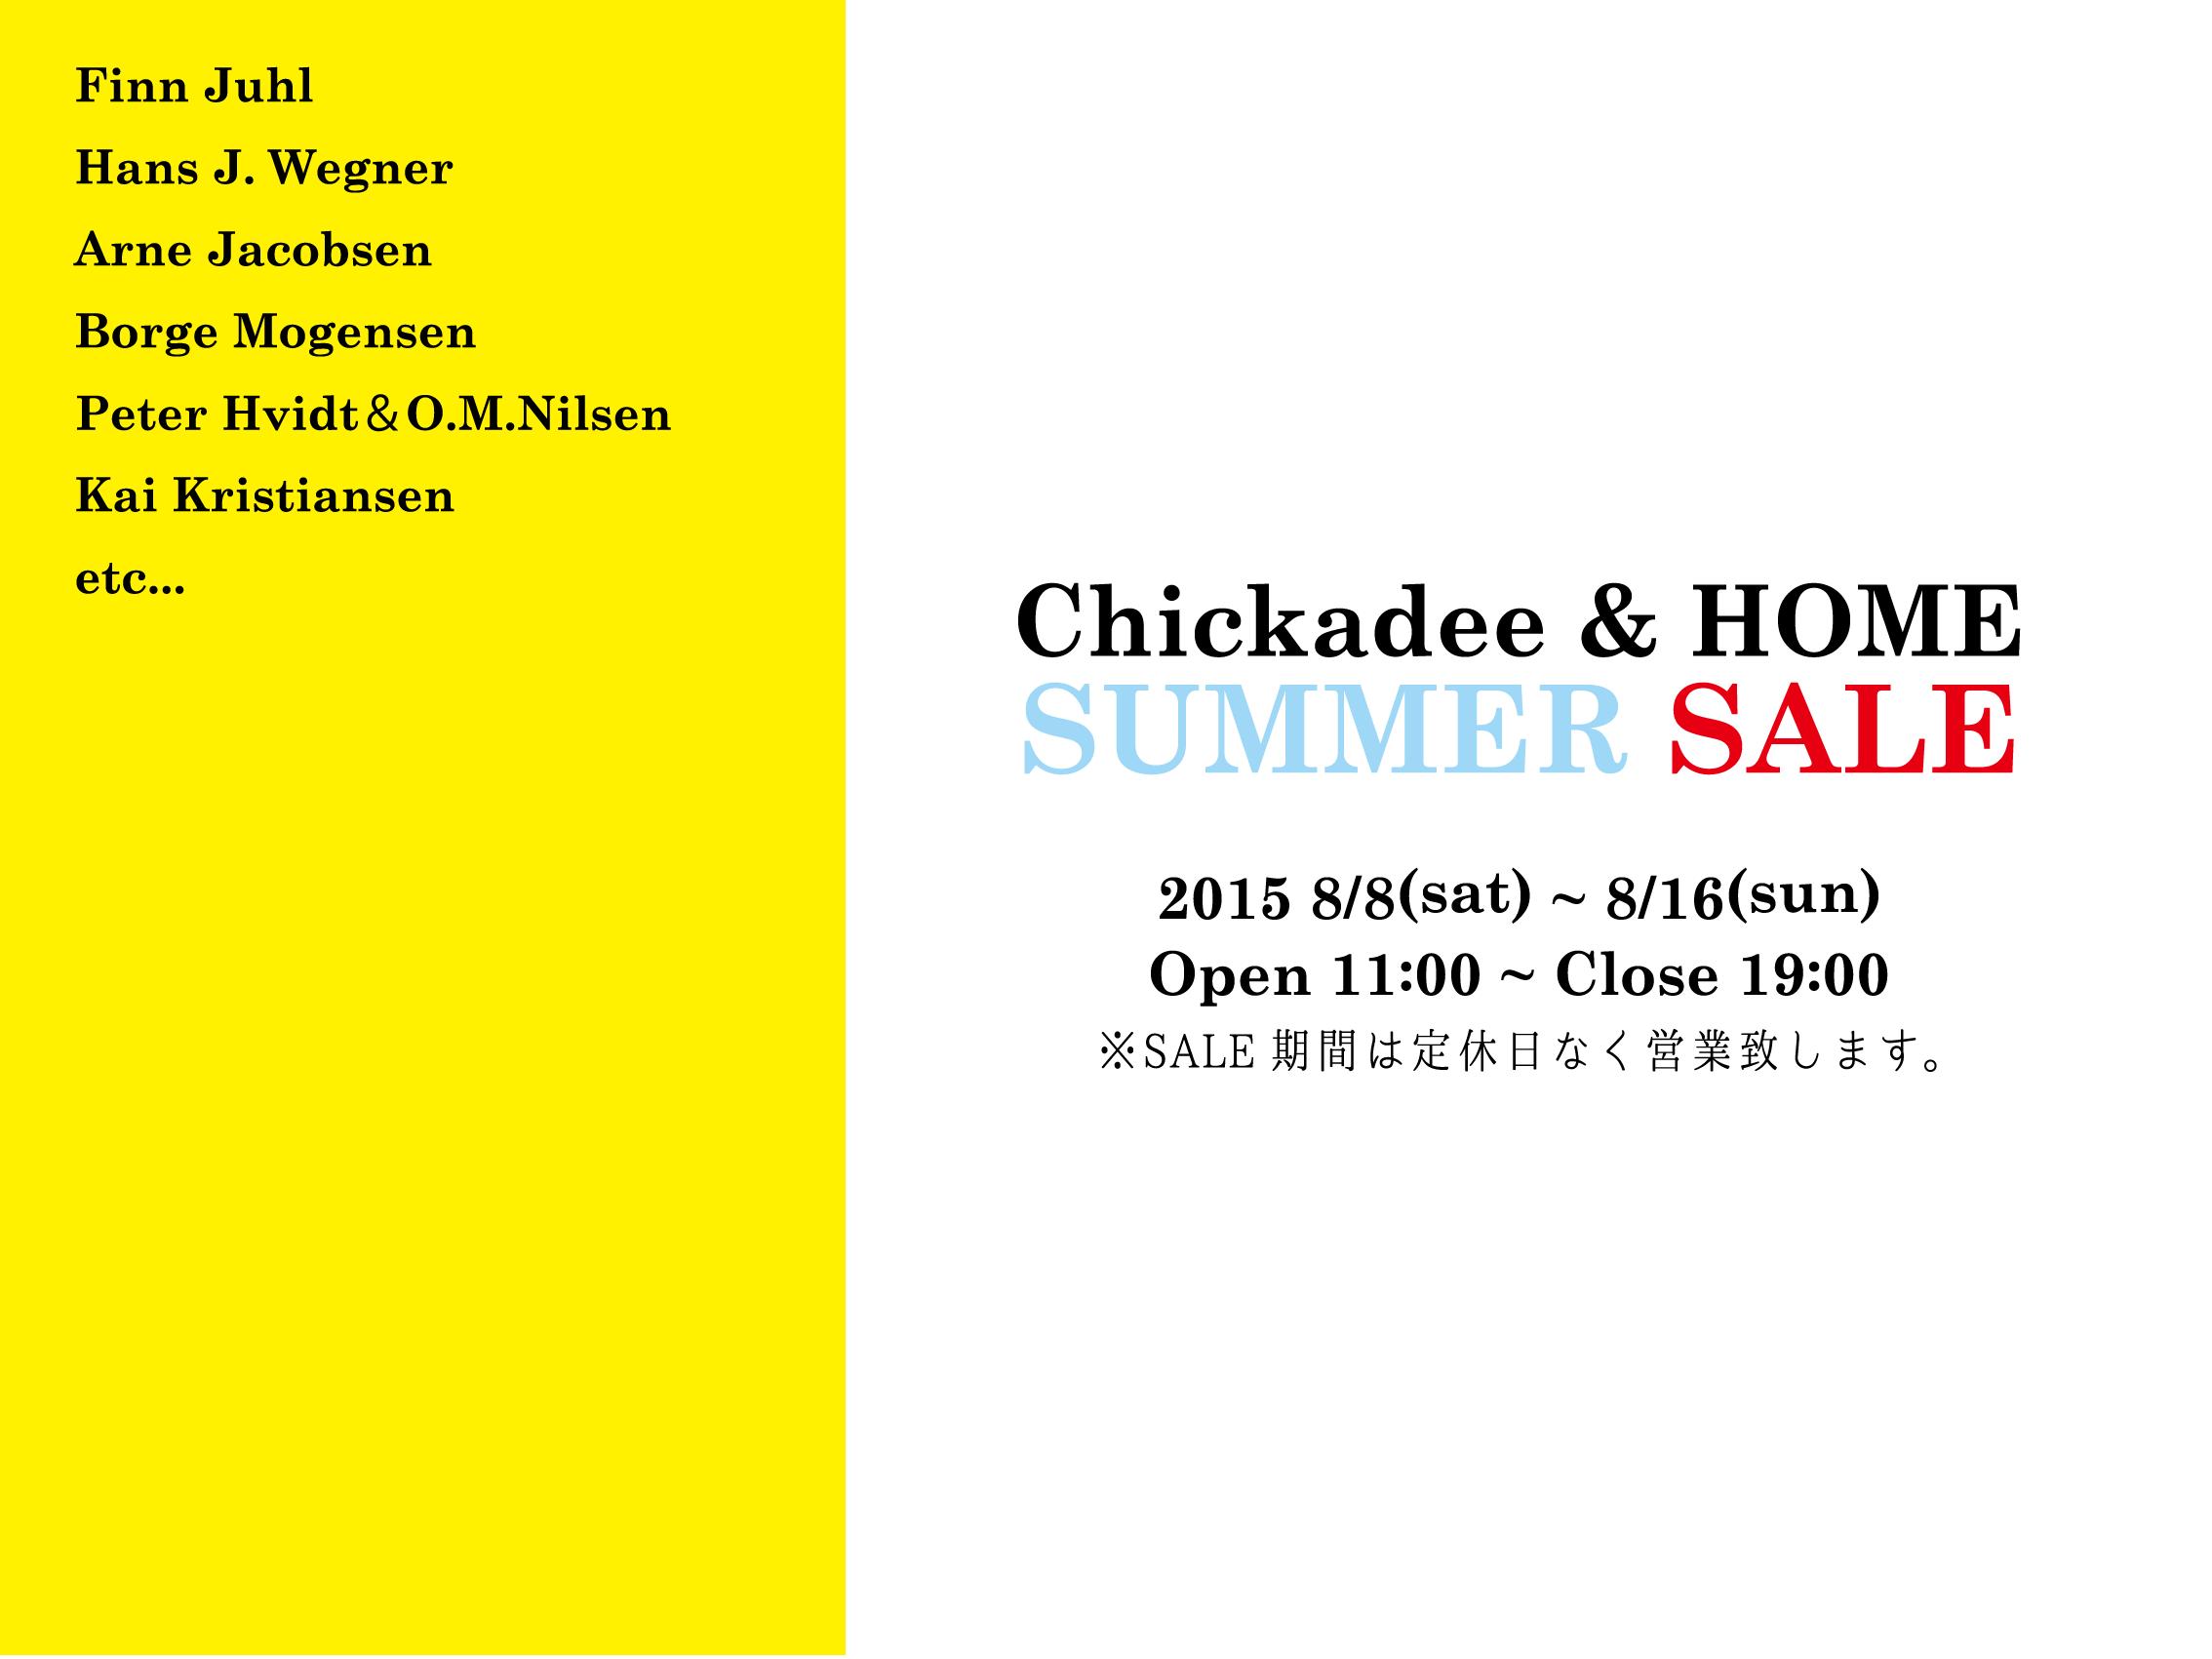 SALE 広告